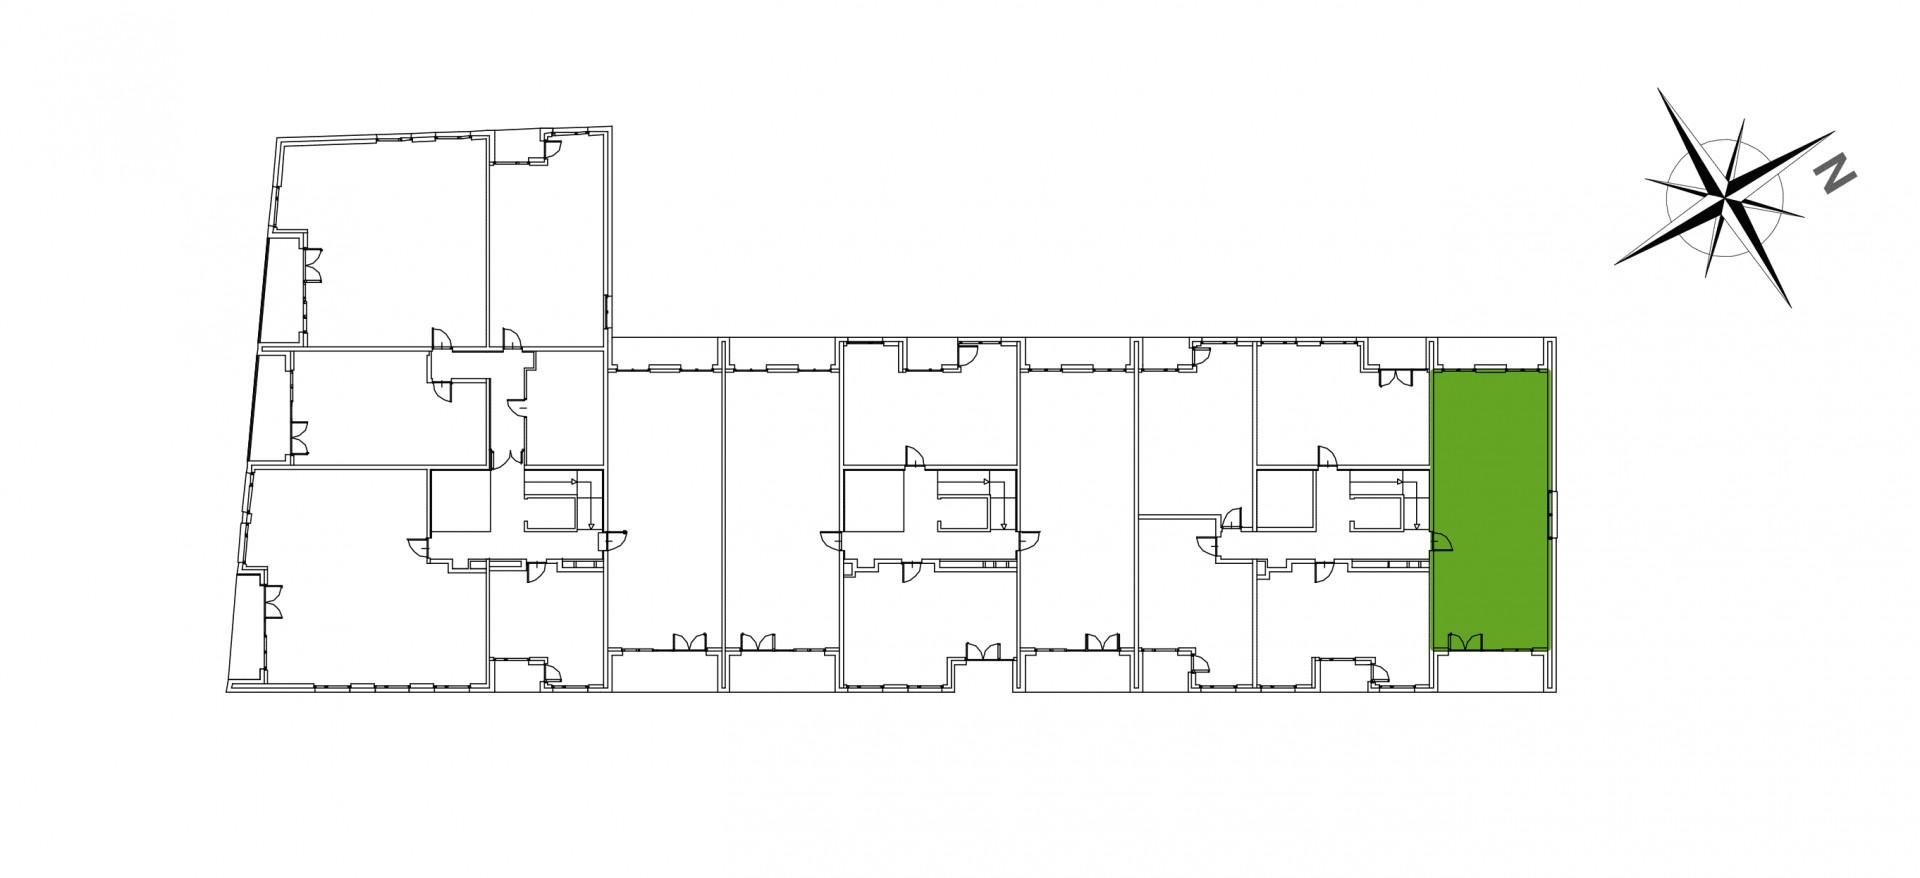 Mazowiecka 72 / apartament nr 14 rzut 2